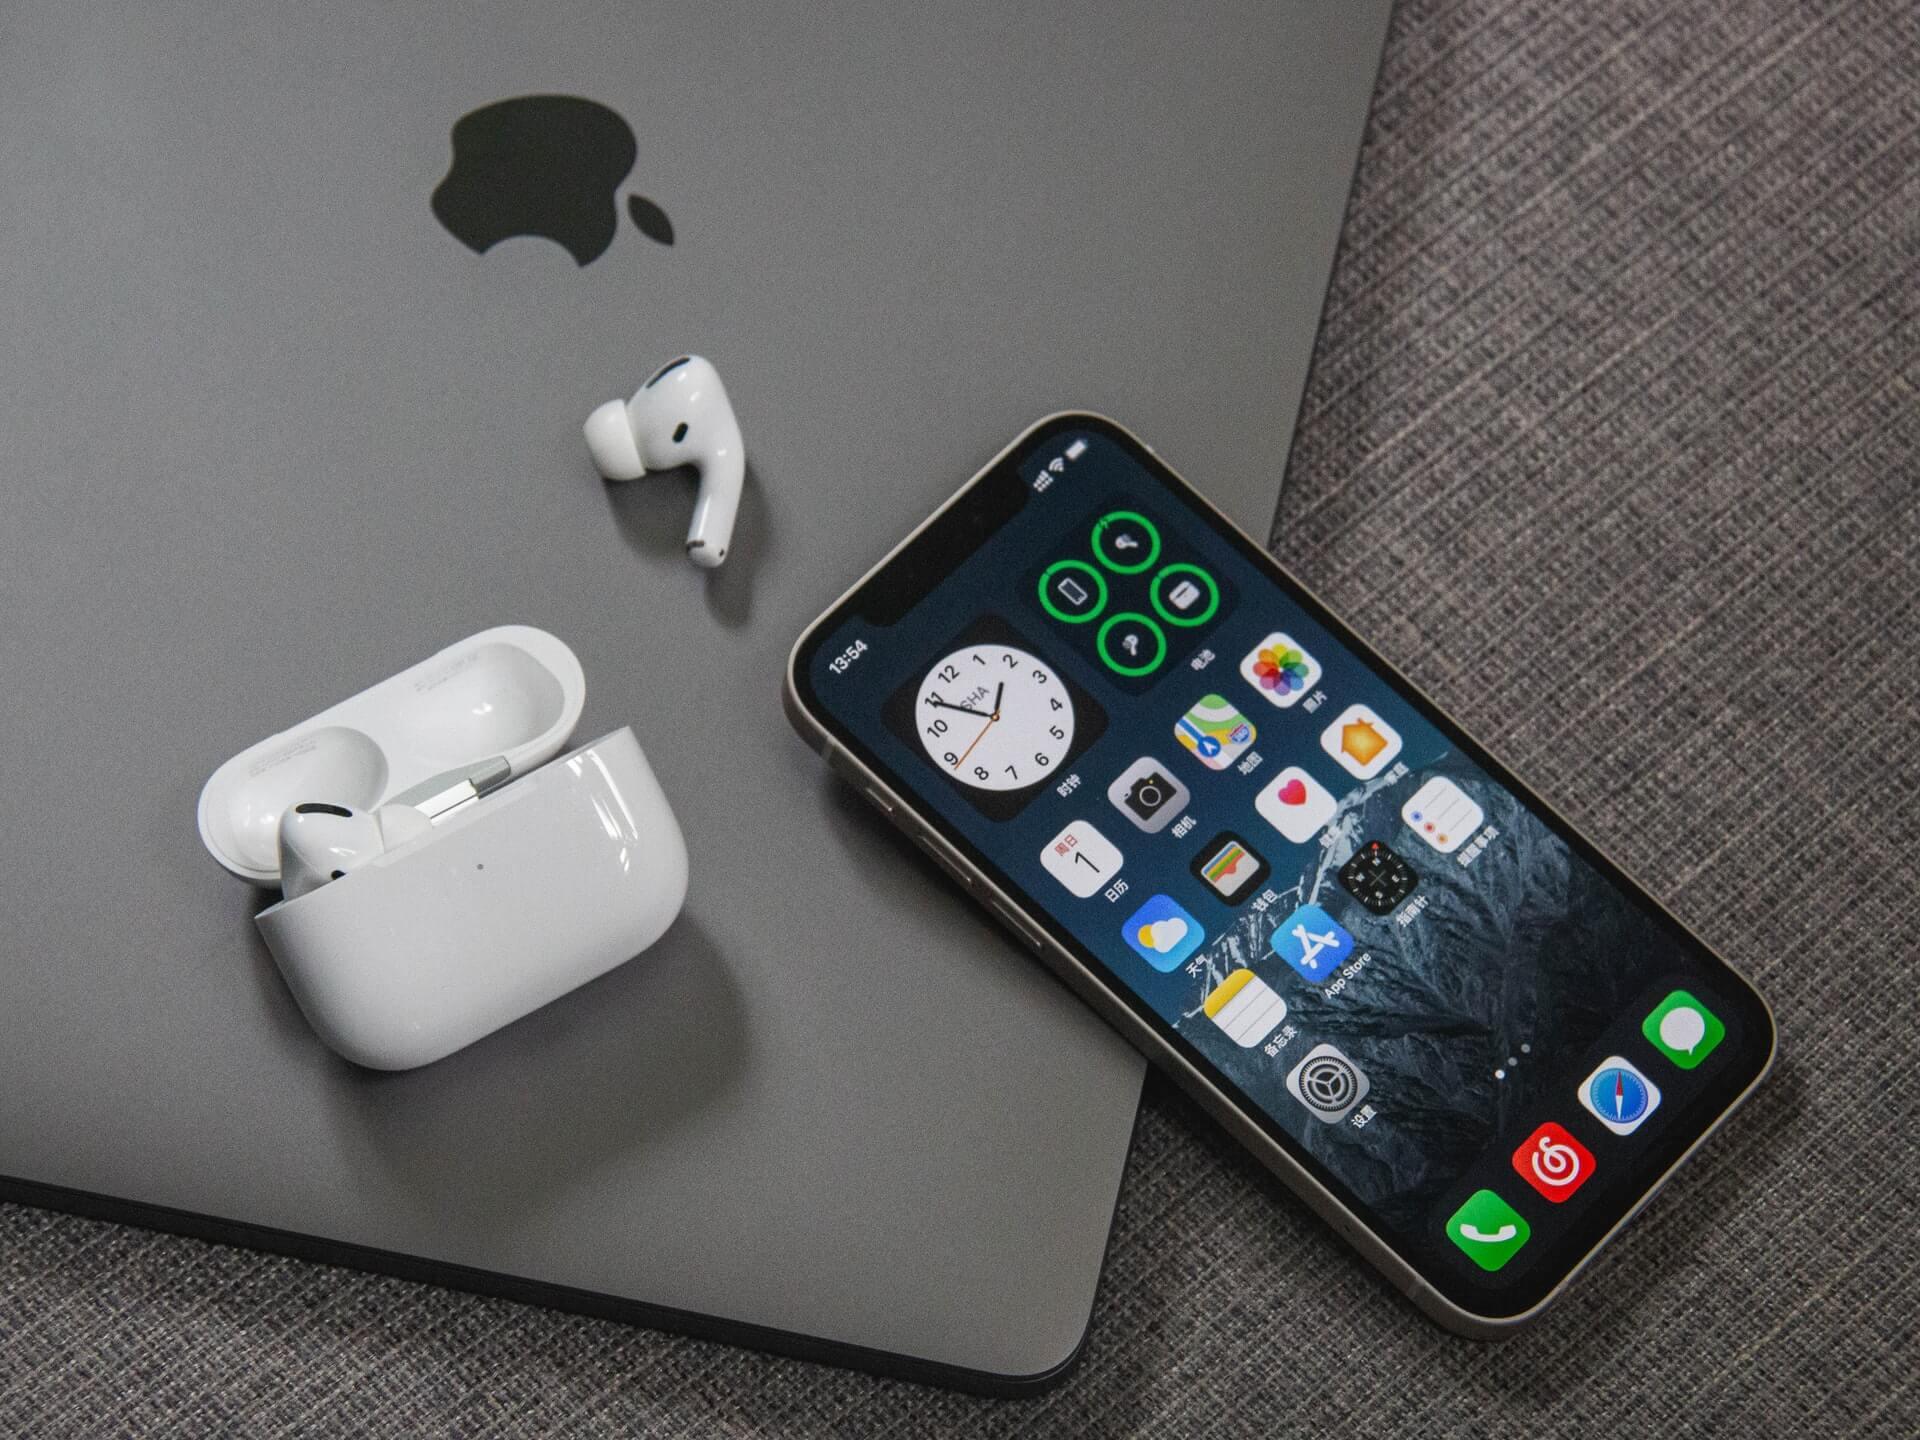 nieobsługiwane akcesorium iphone